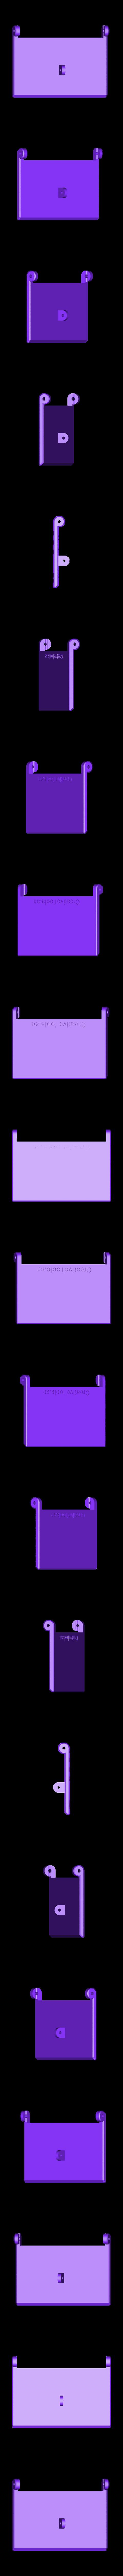 Smartphone_Desktop_Stand_adjustable_angle_-_Backplate_-_By_CreativeTools.se.stl Download free STL file Smartphone Desktop Stand (adjustable angle) • 3D printer object, CreativeTools